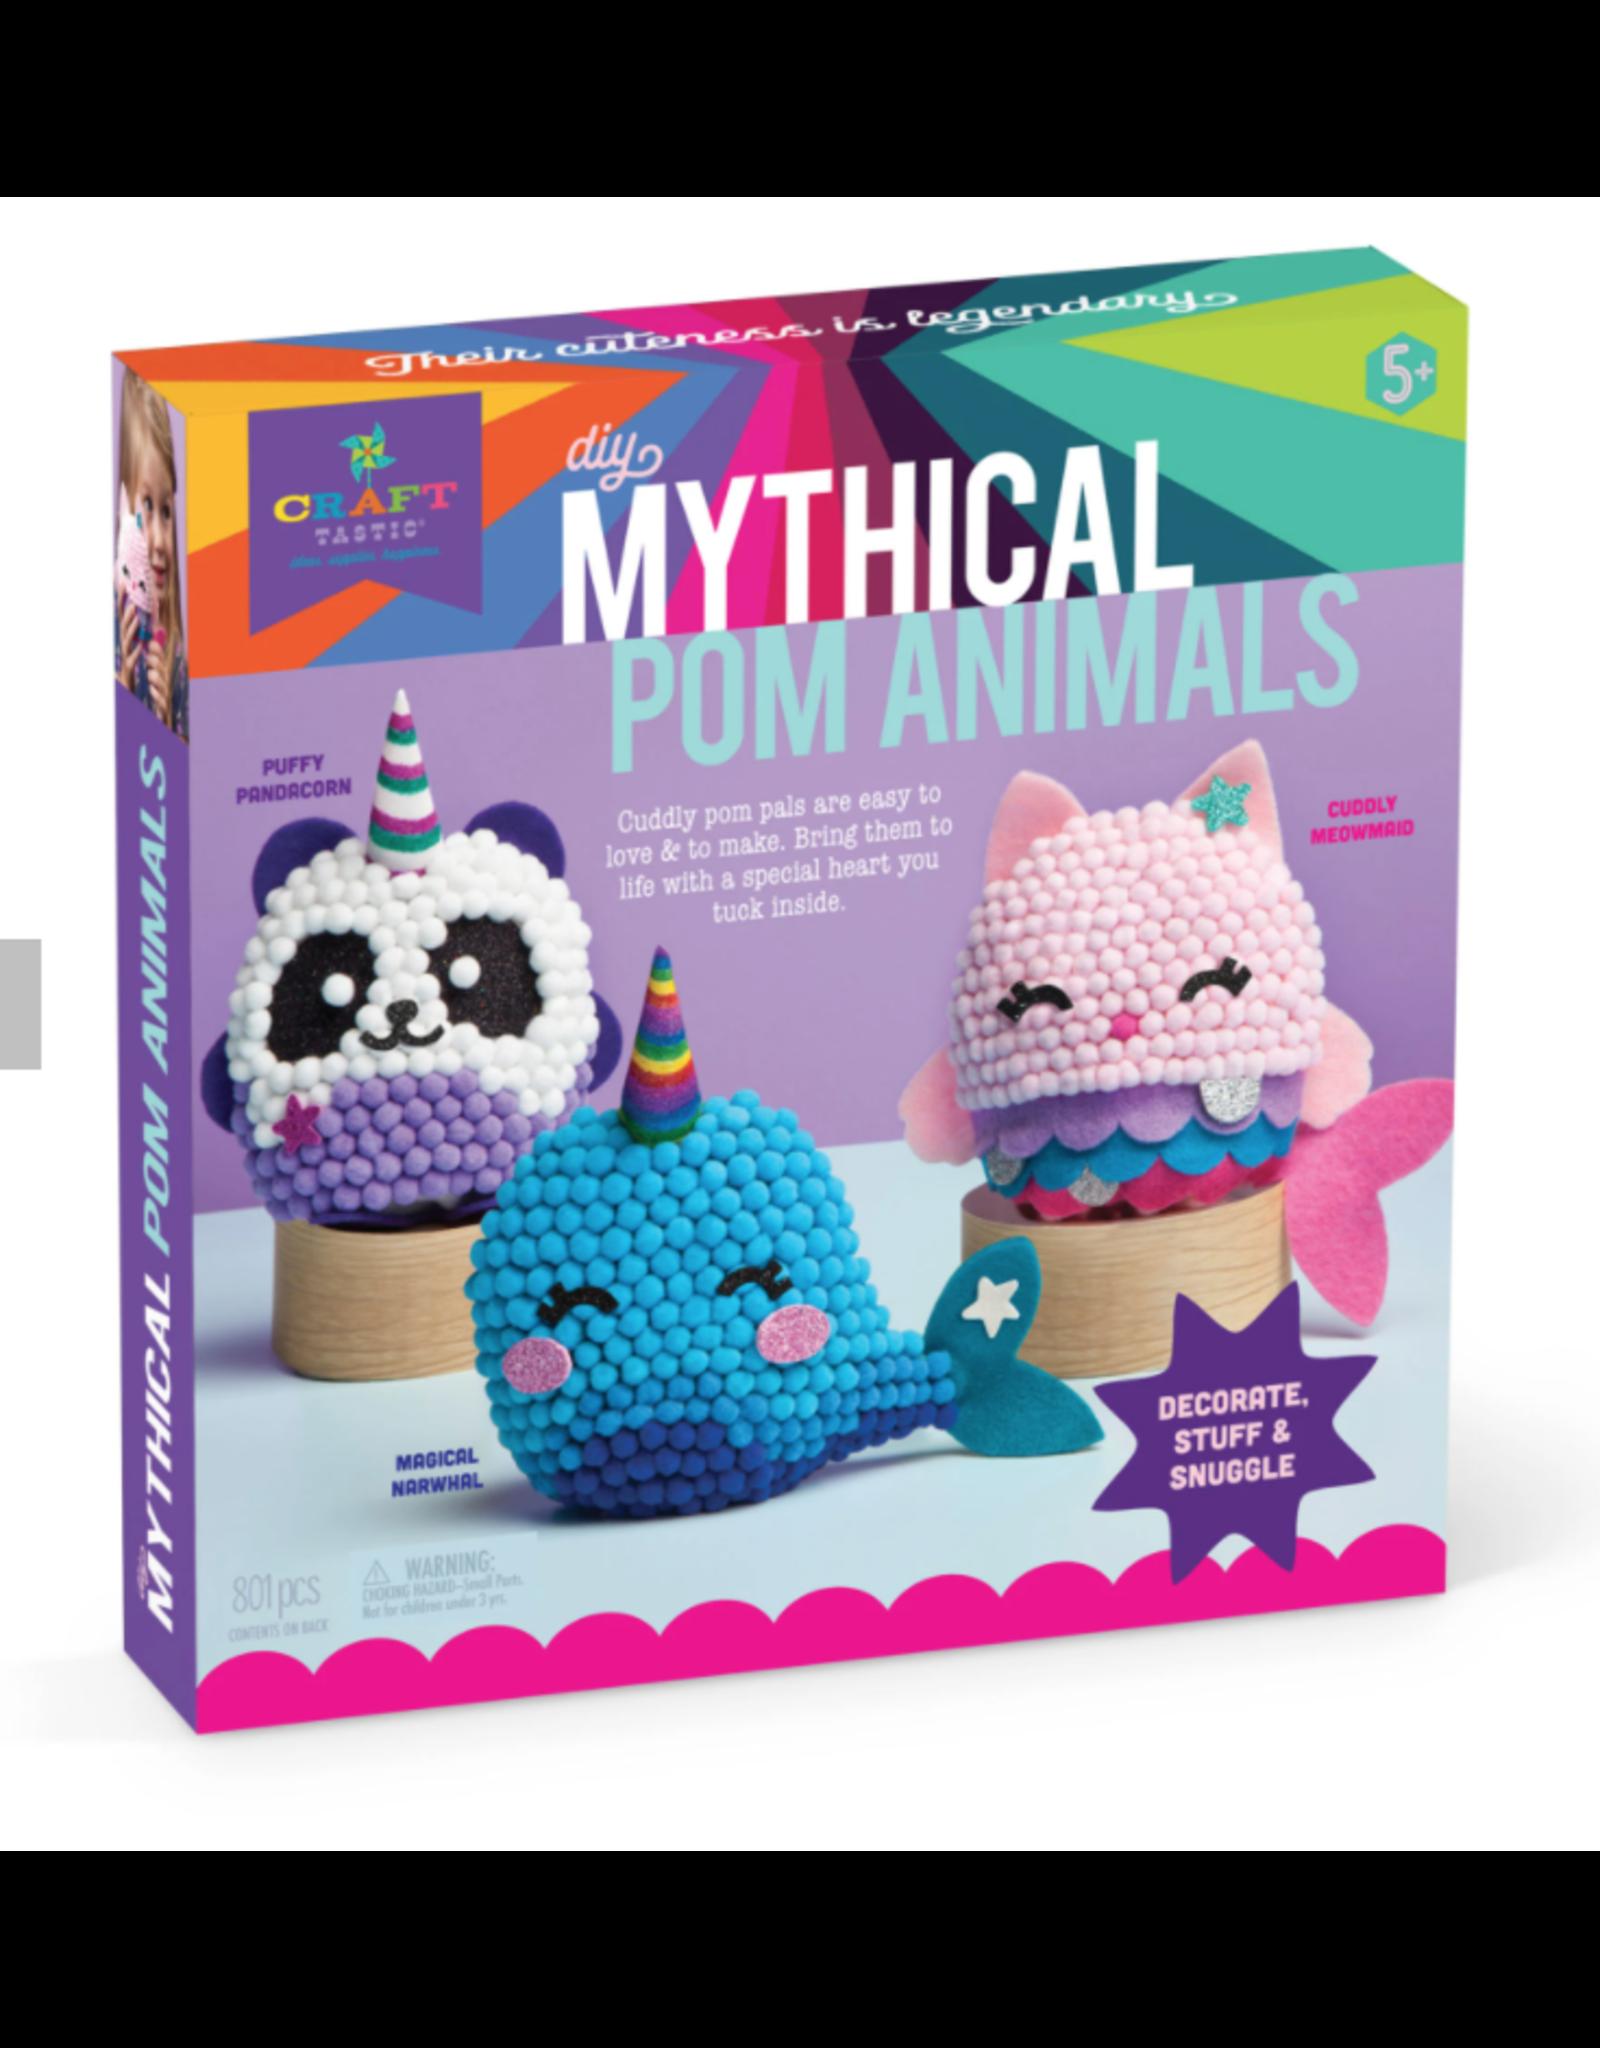 Craft Tastic DIY Mythical Pom Animals